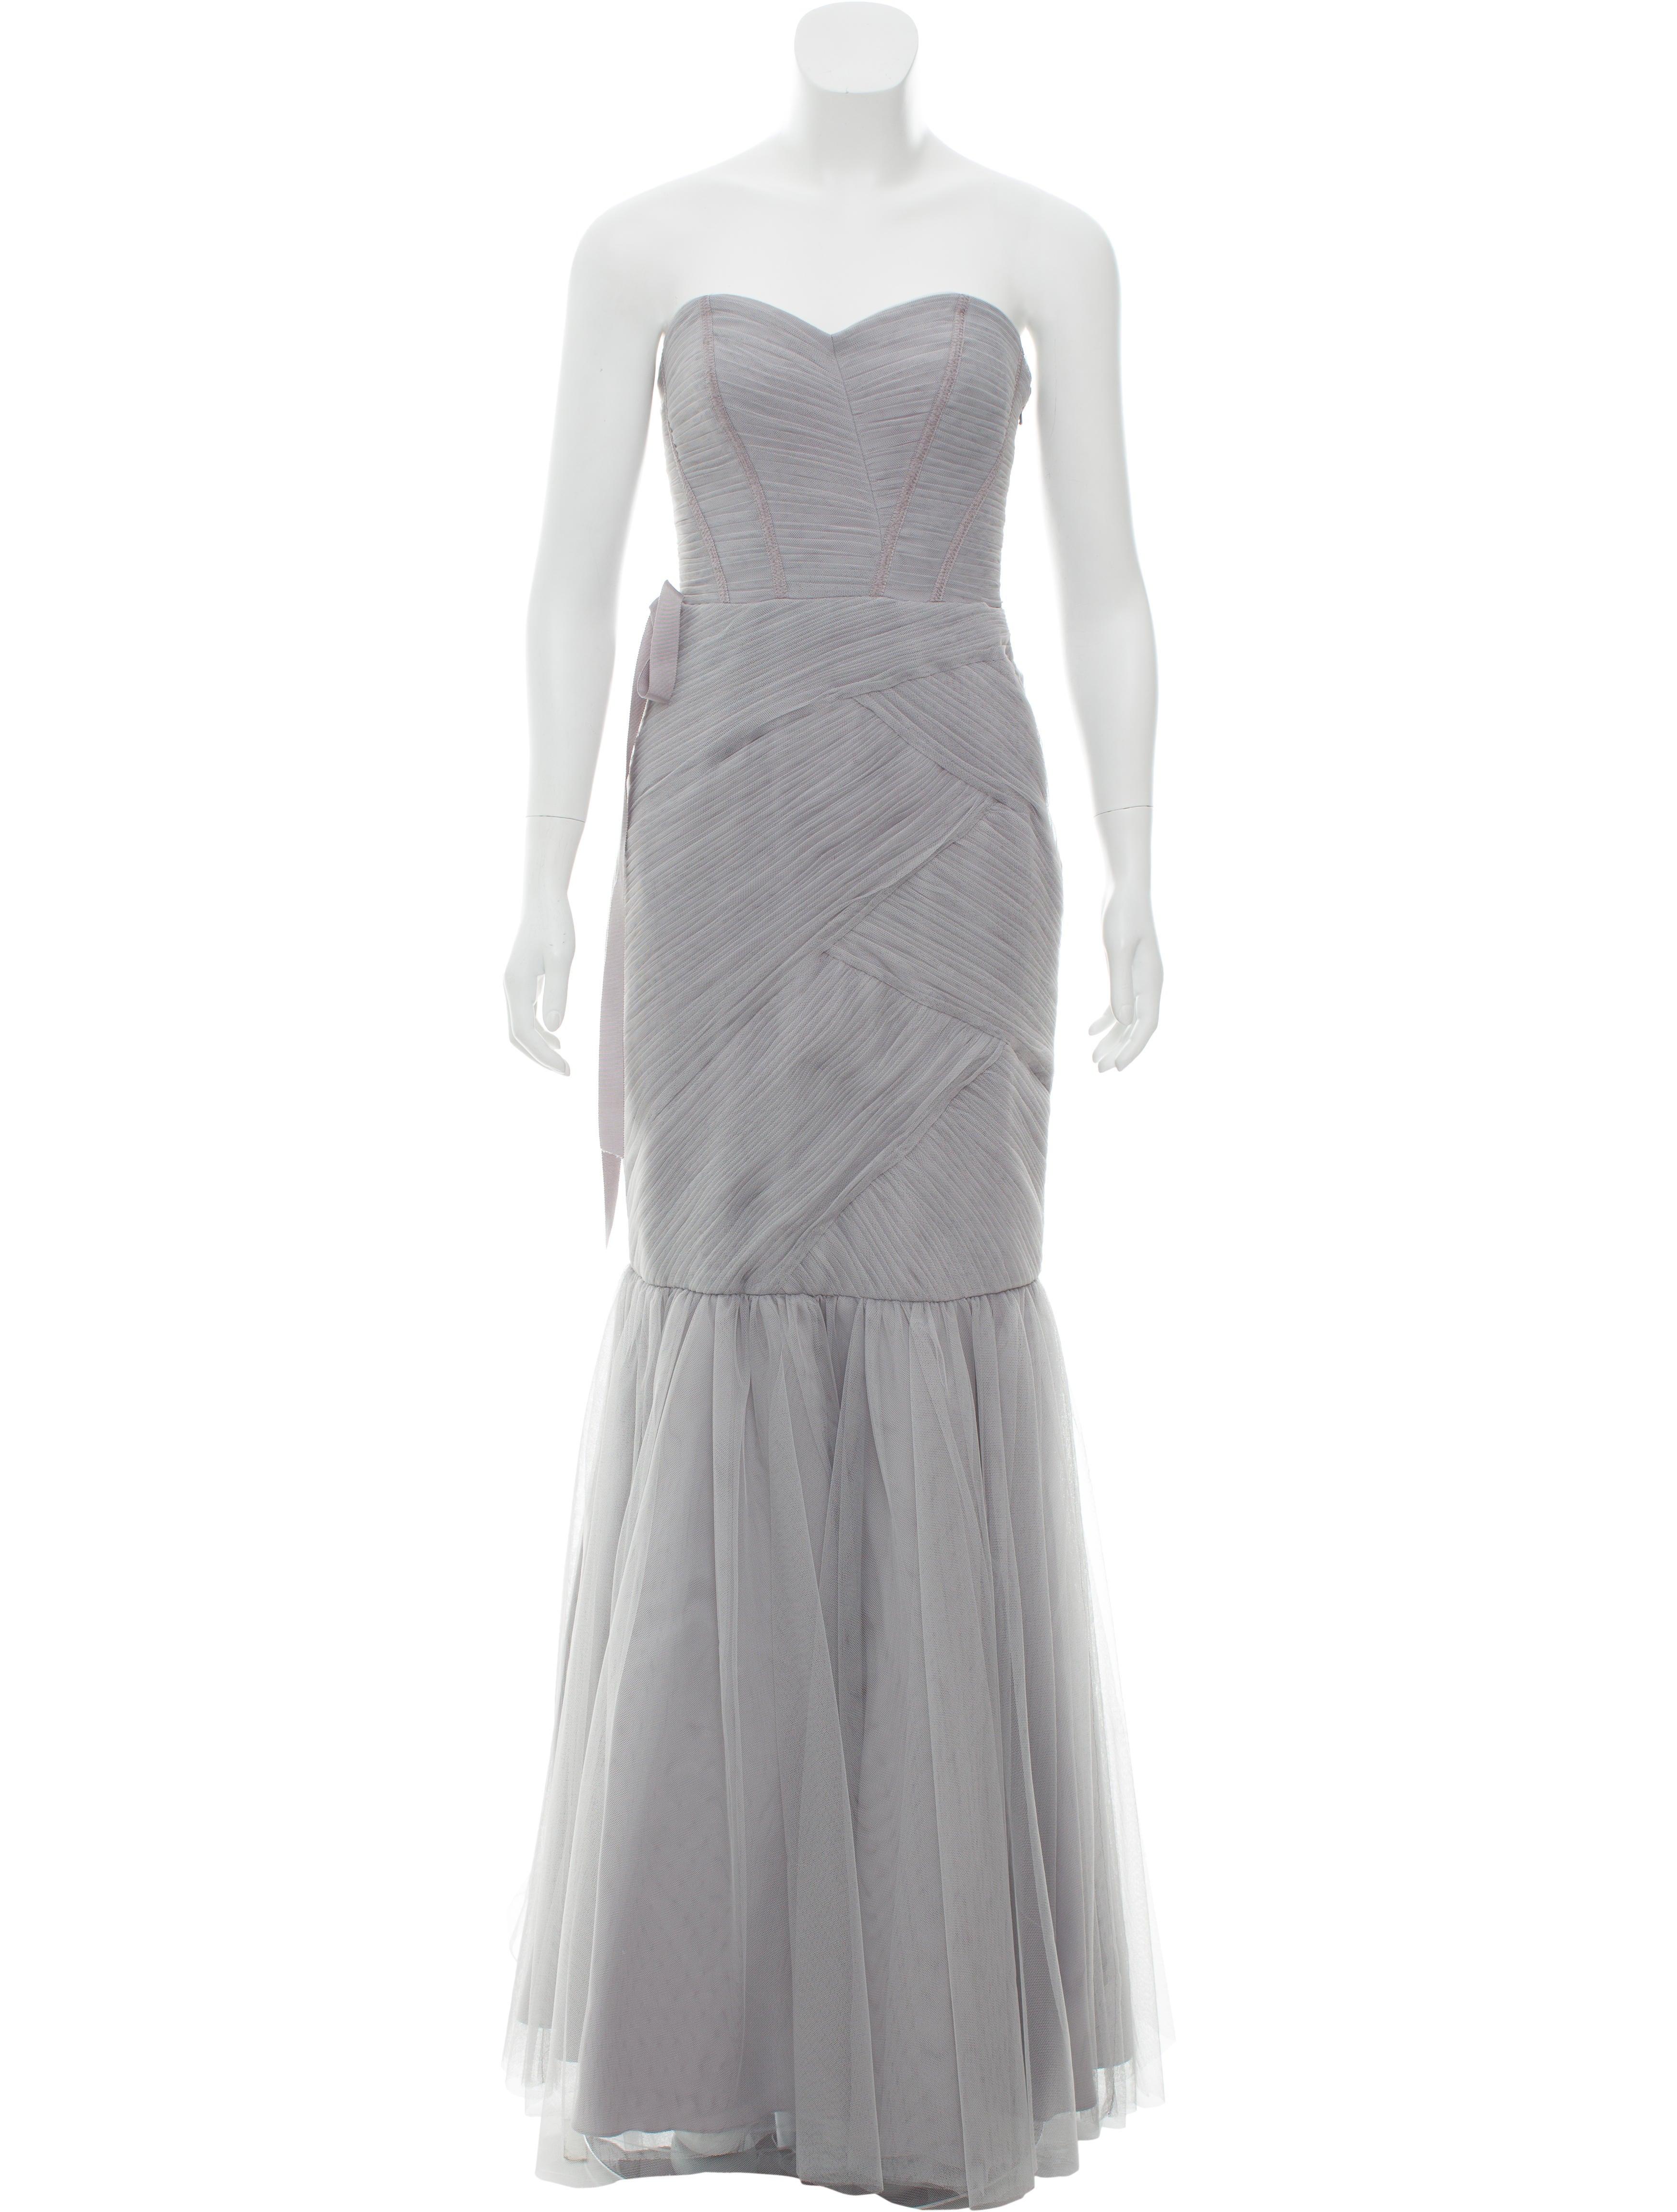 Monique Lhuillier Bridesmaids Strapless Tulle Evening Dress w/ Tags ...